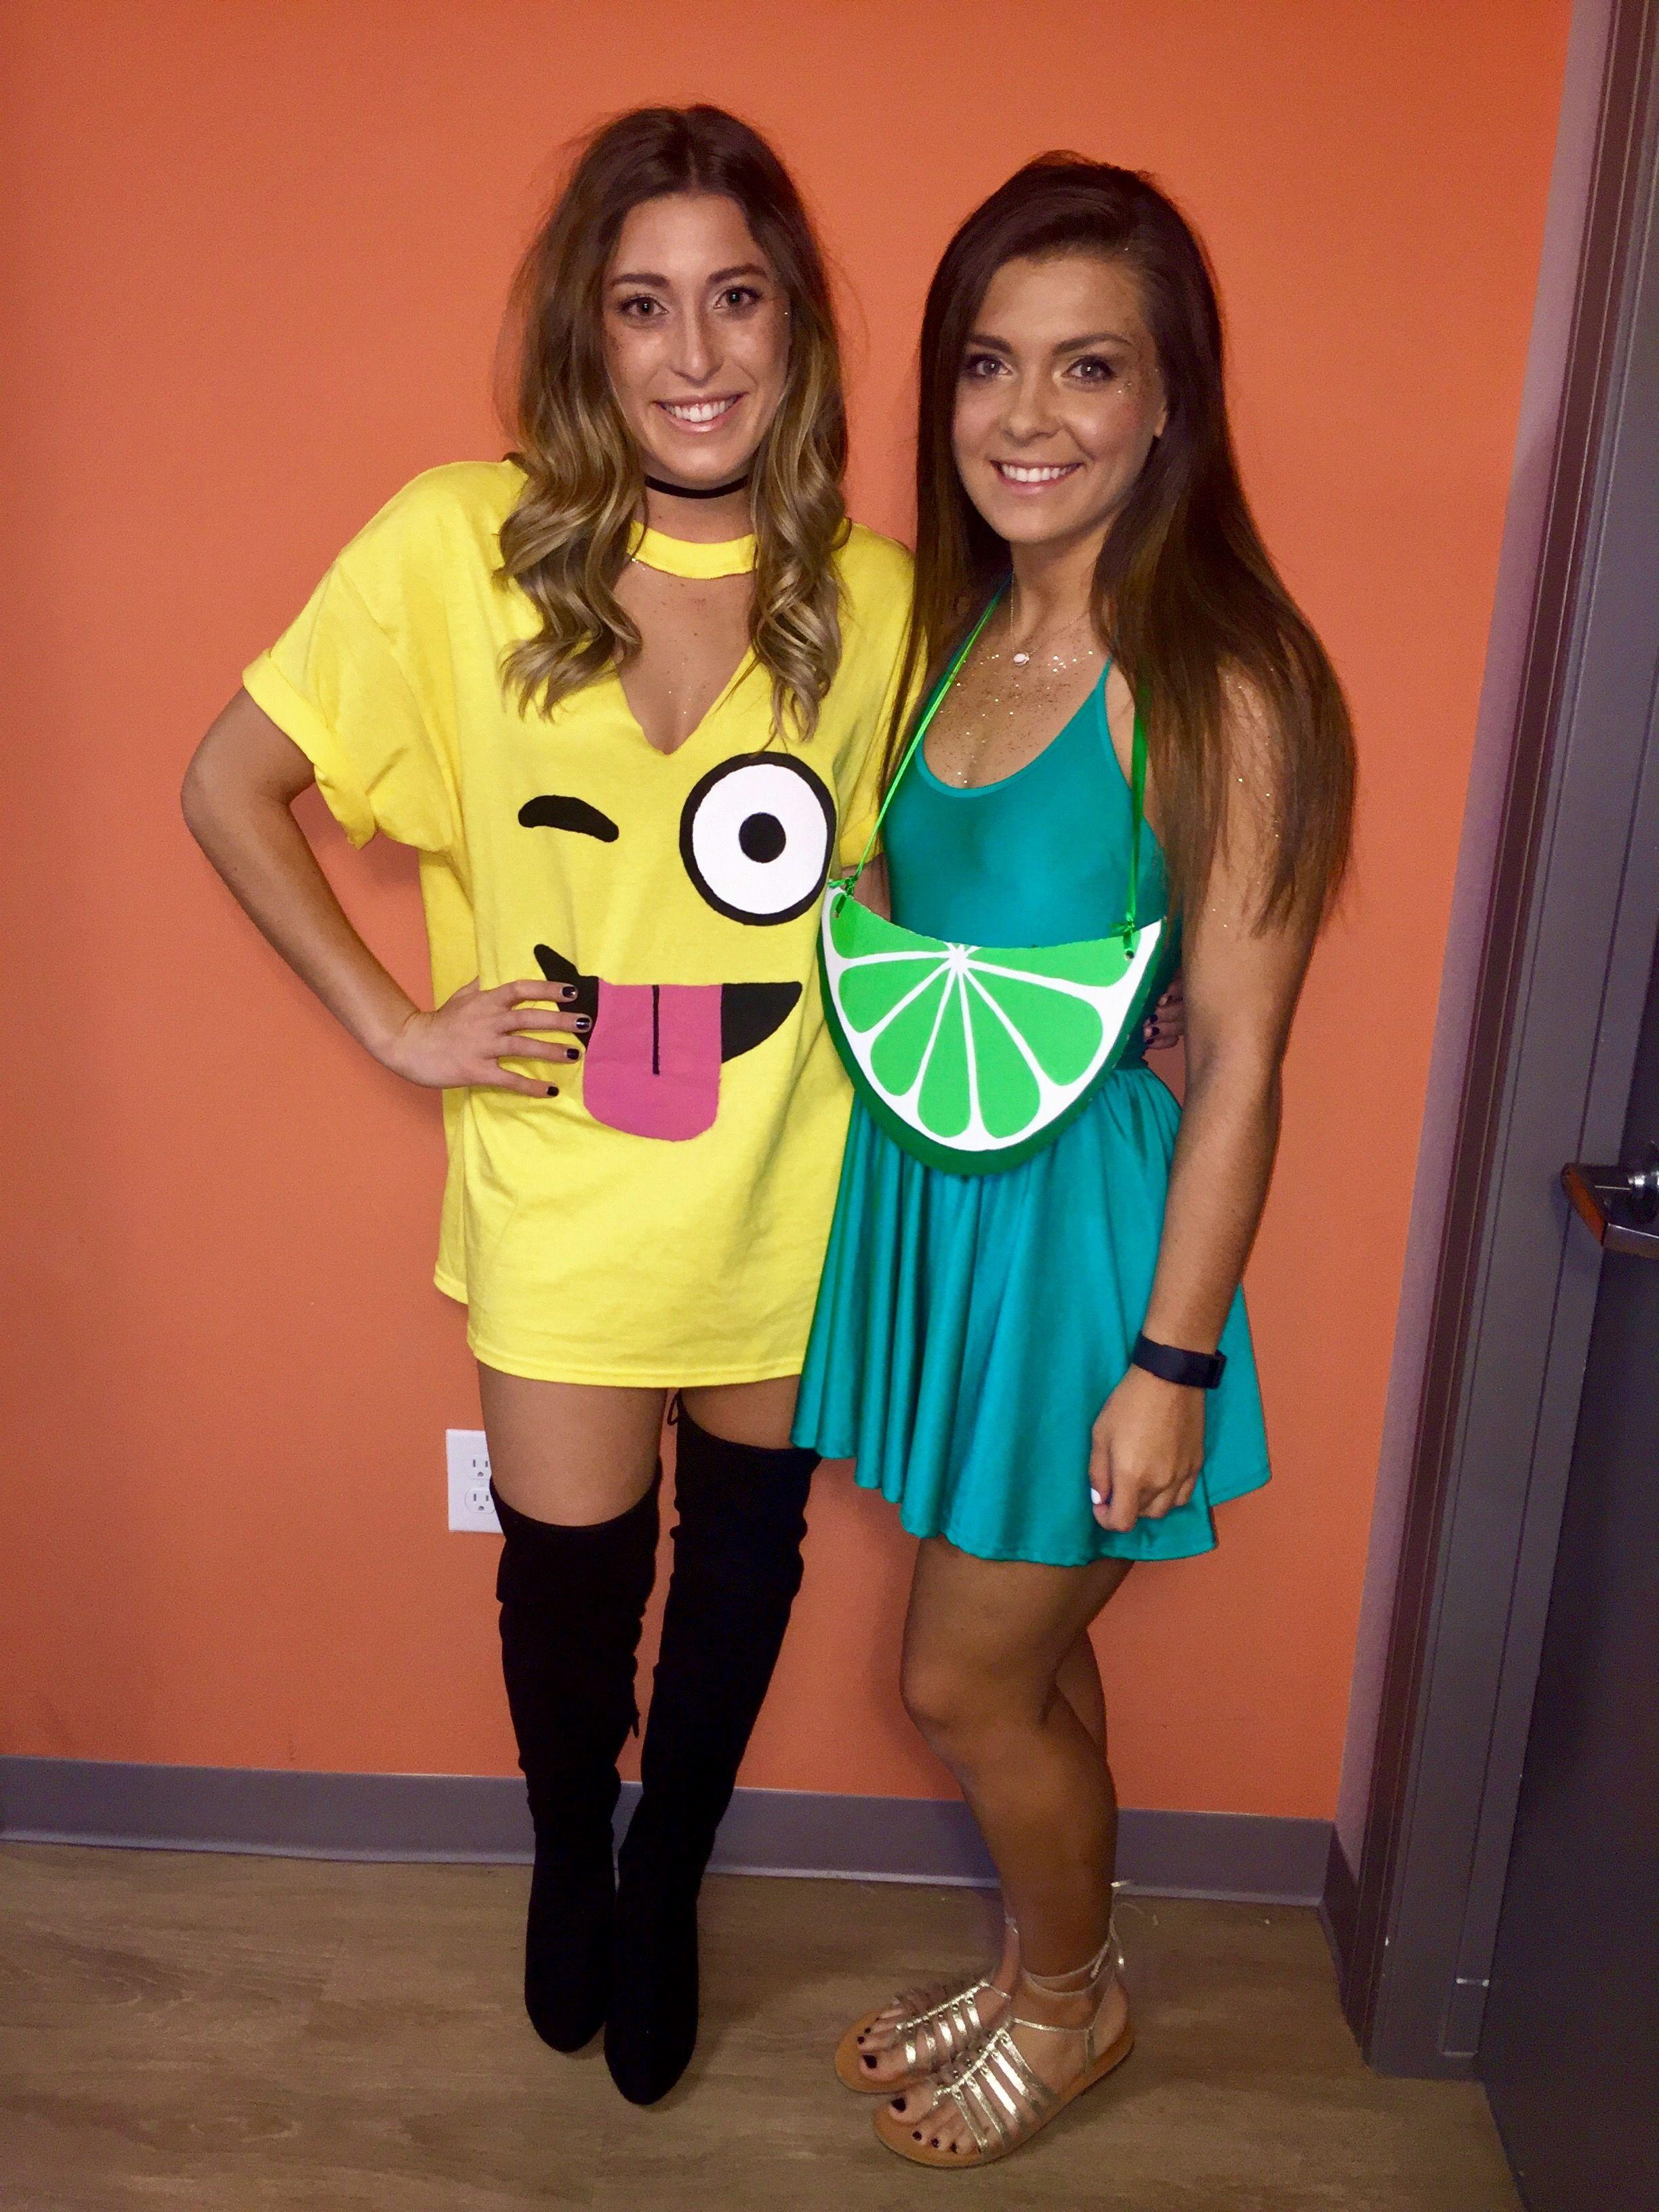 Lime and emoji Halloween costume Halloween costumes